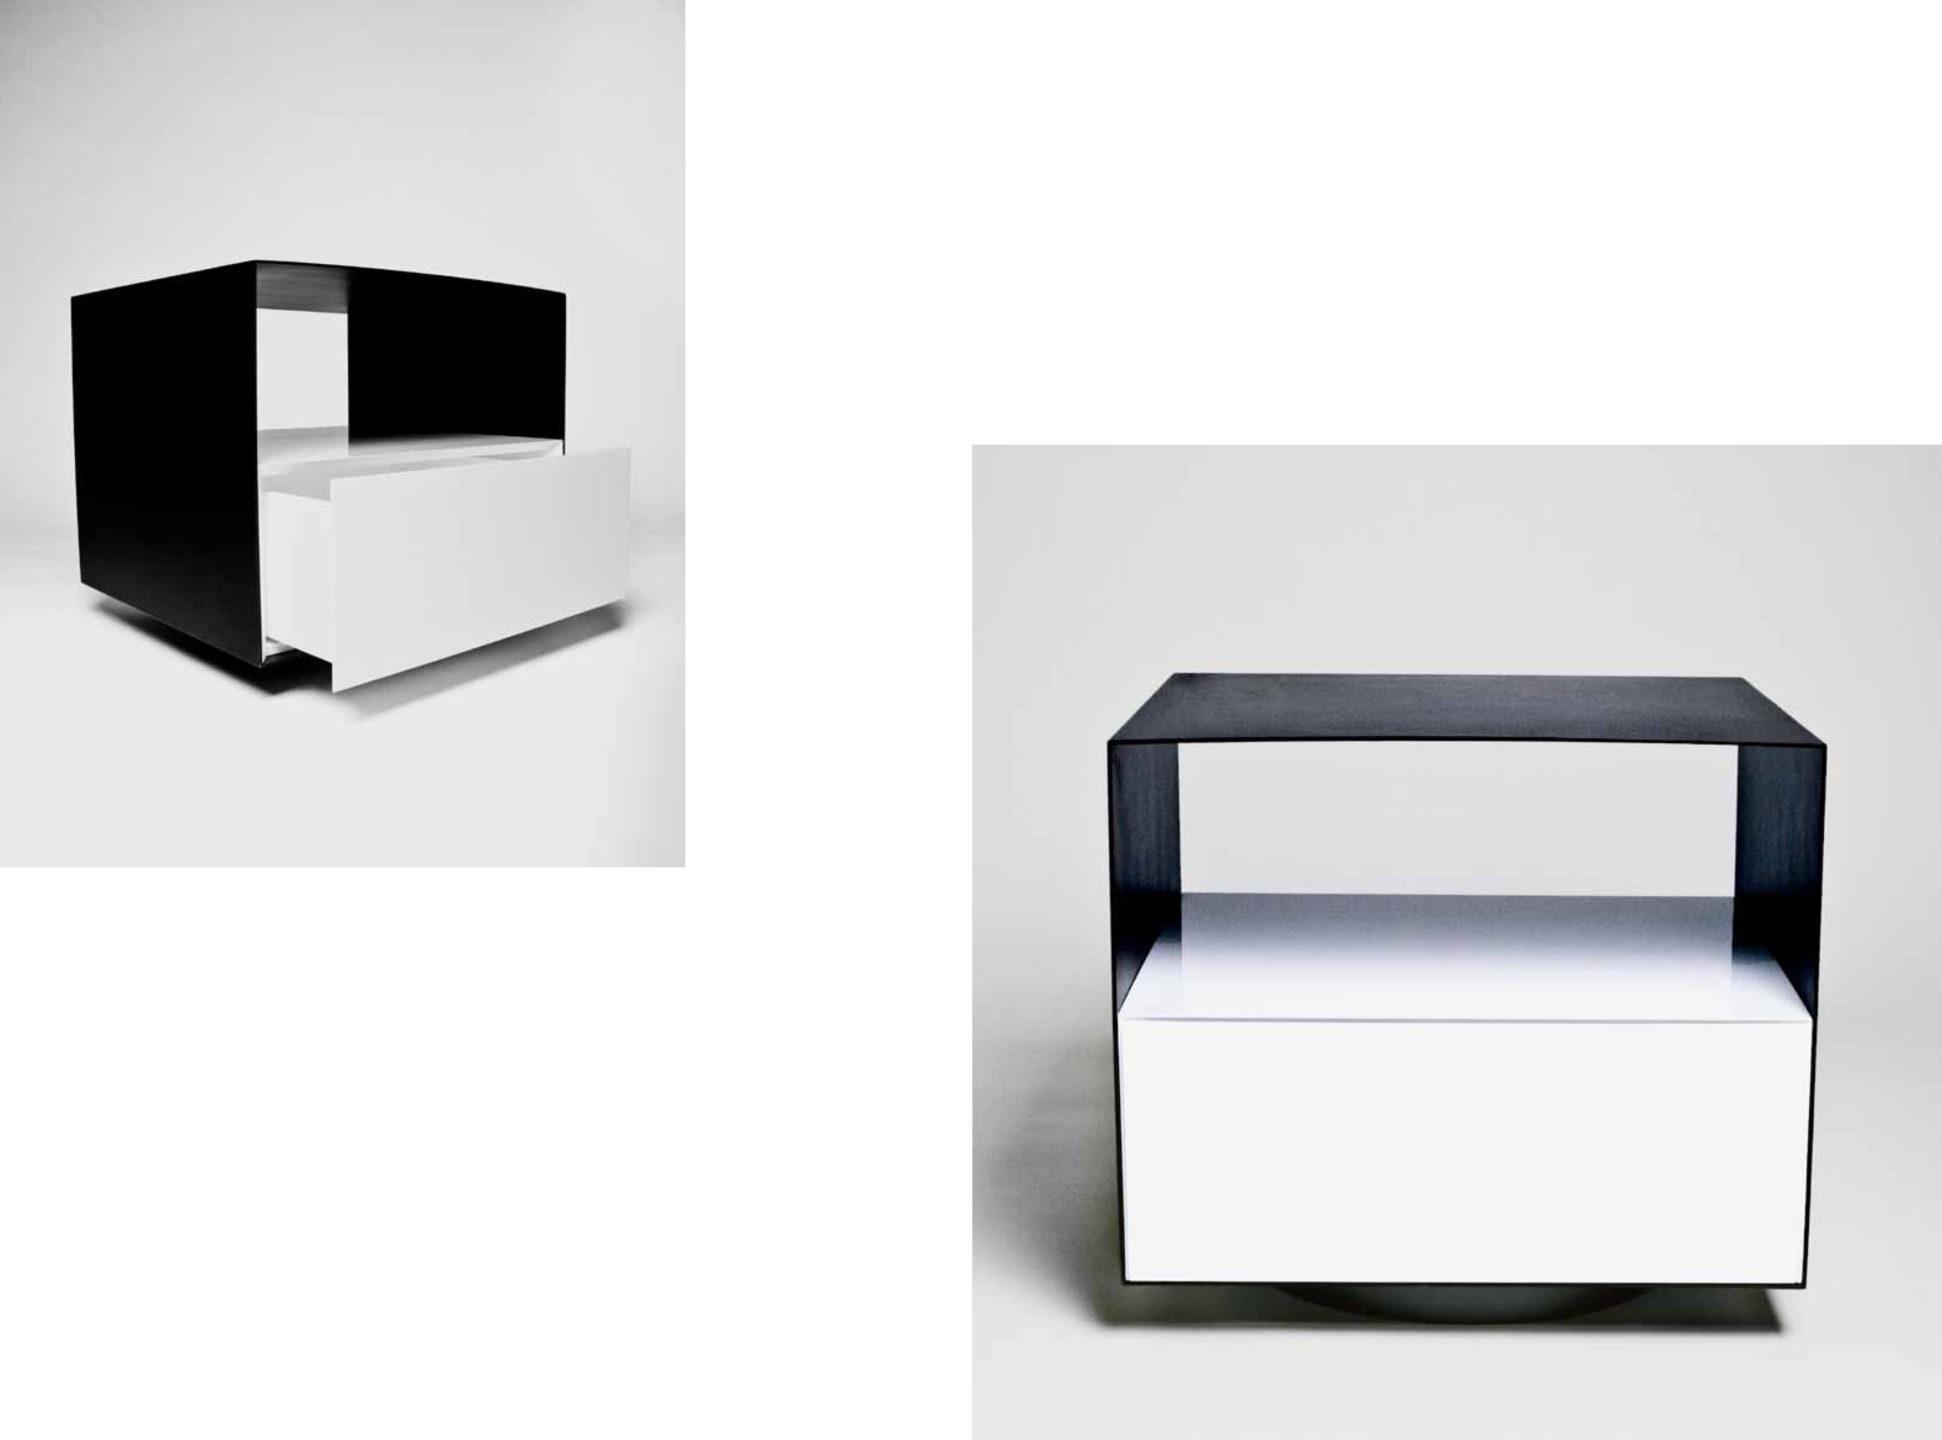 BOOM-BOX-nightstand-4-nicole-fuller-product-information